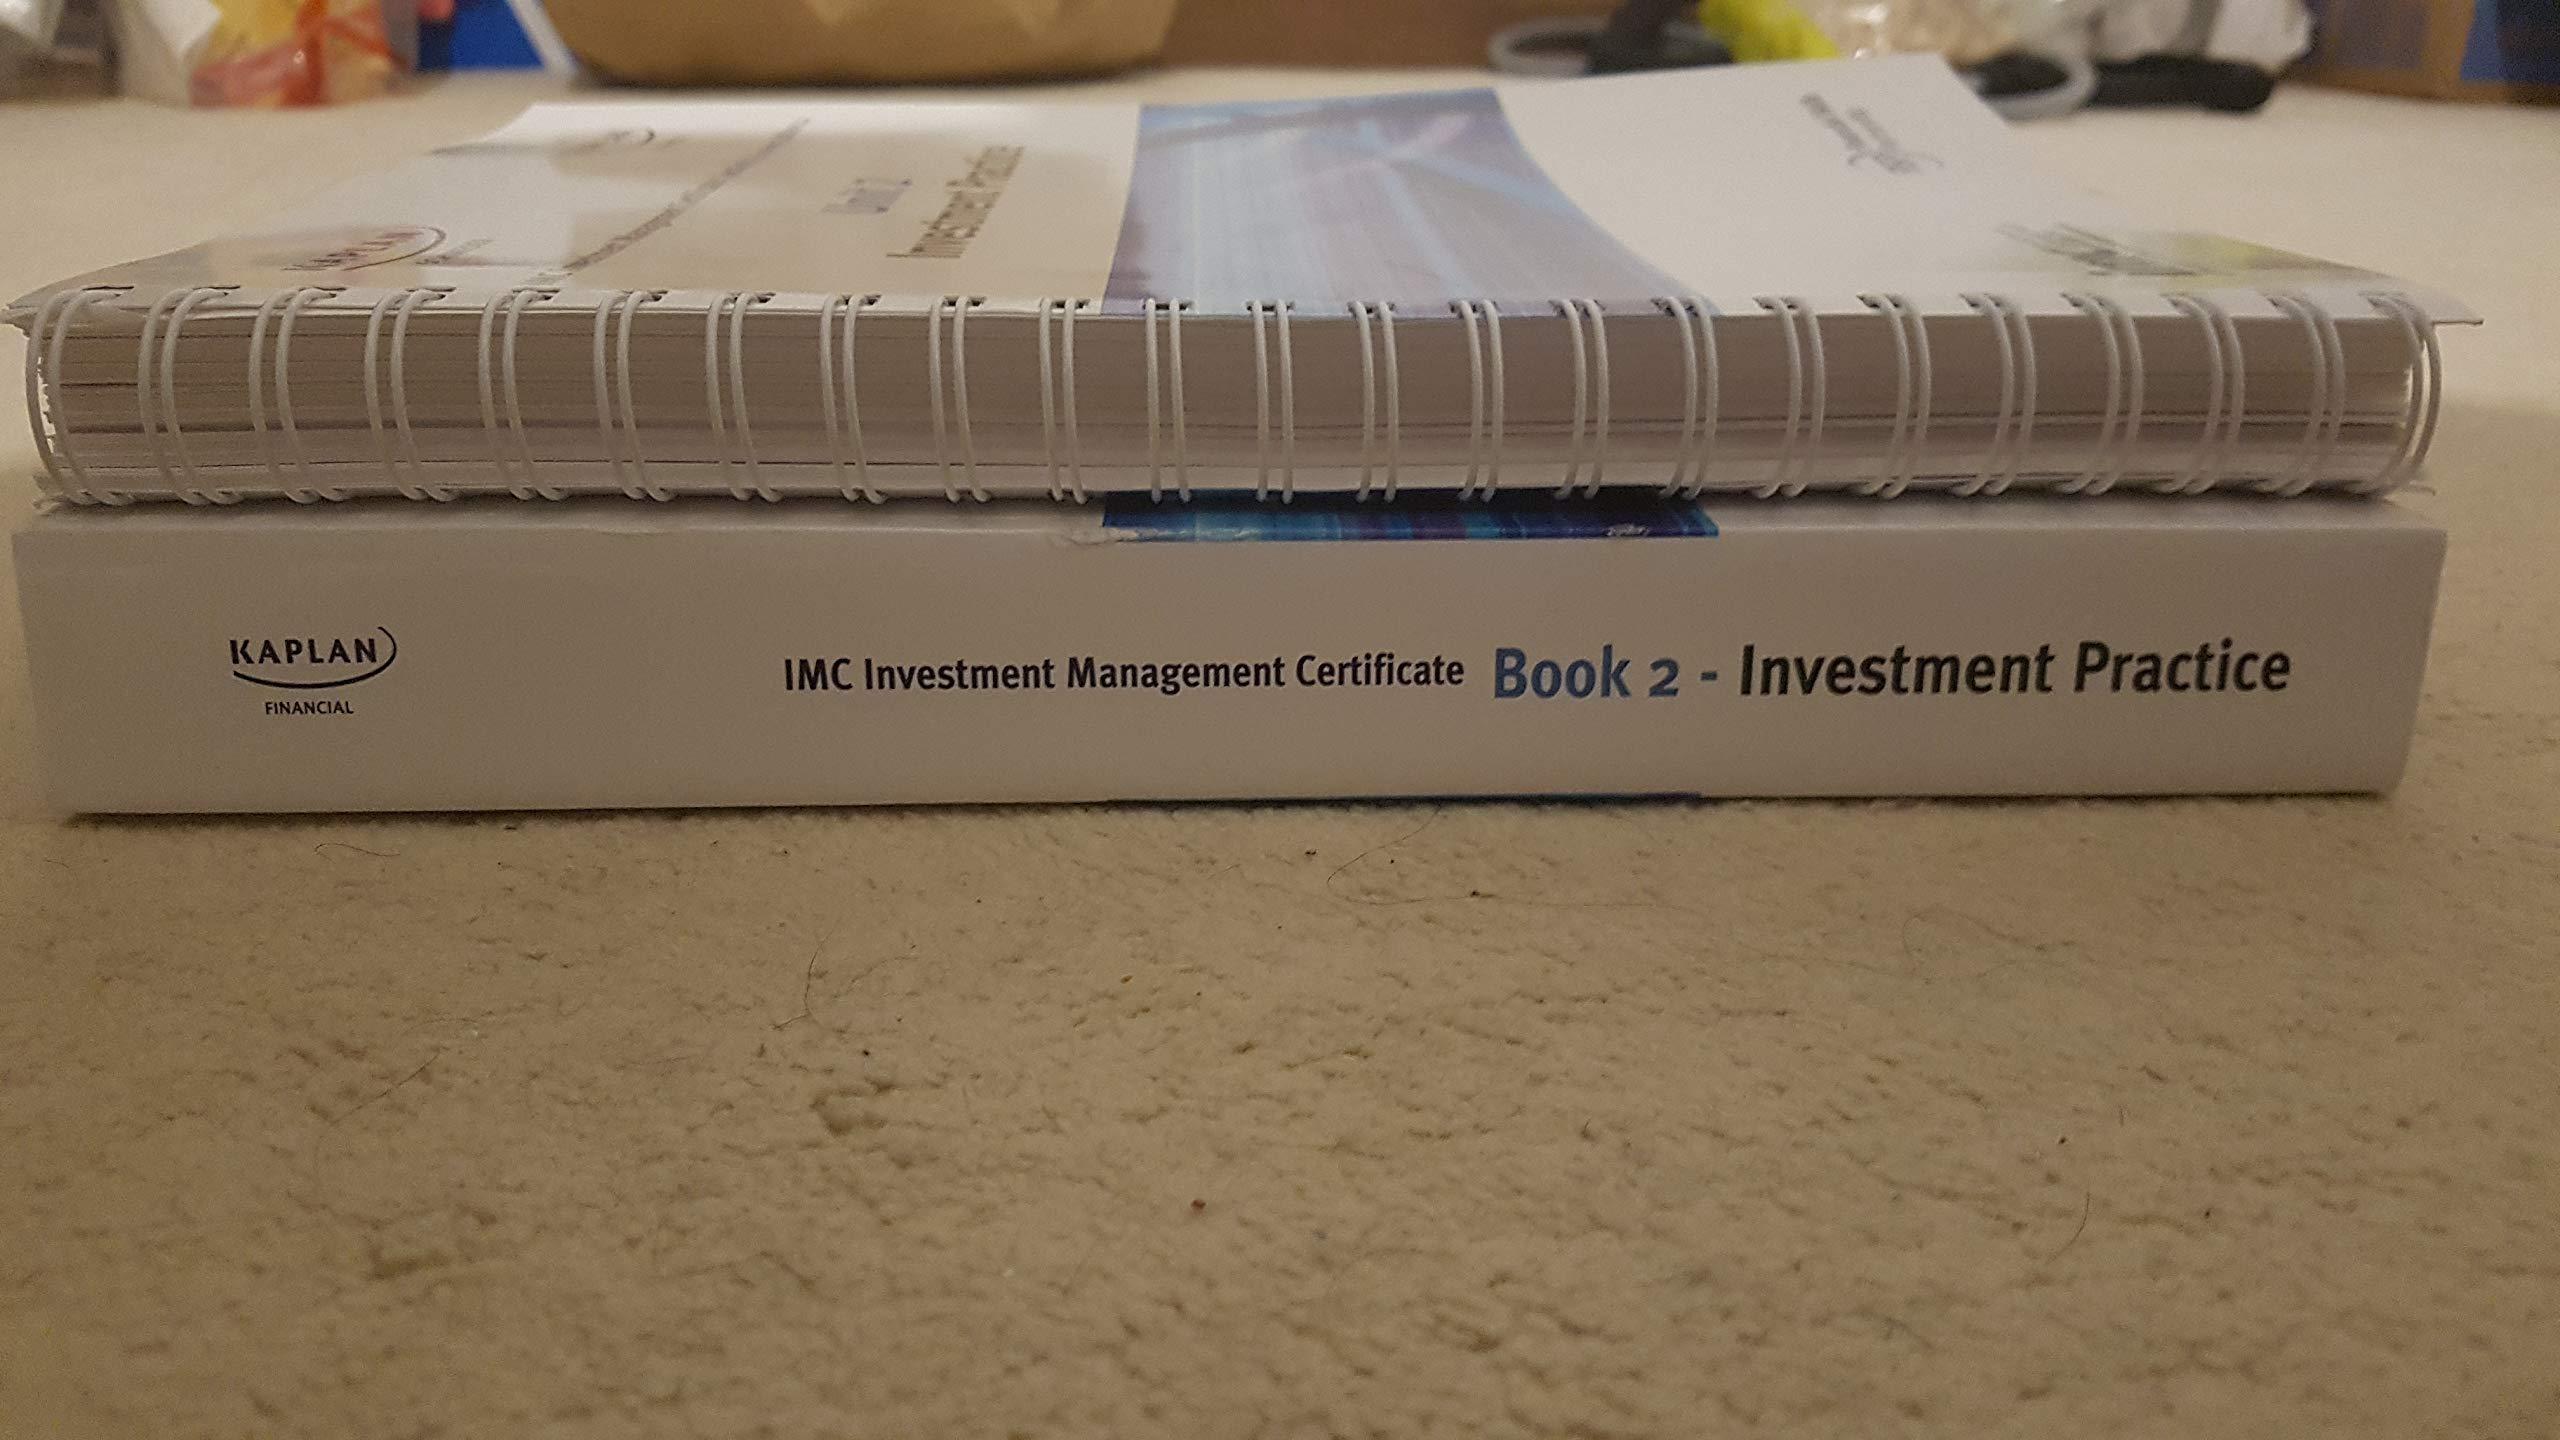 Investment management certificate unit 1 pdf rcfx forex trading